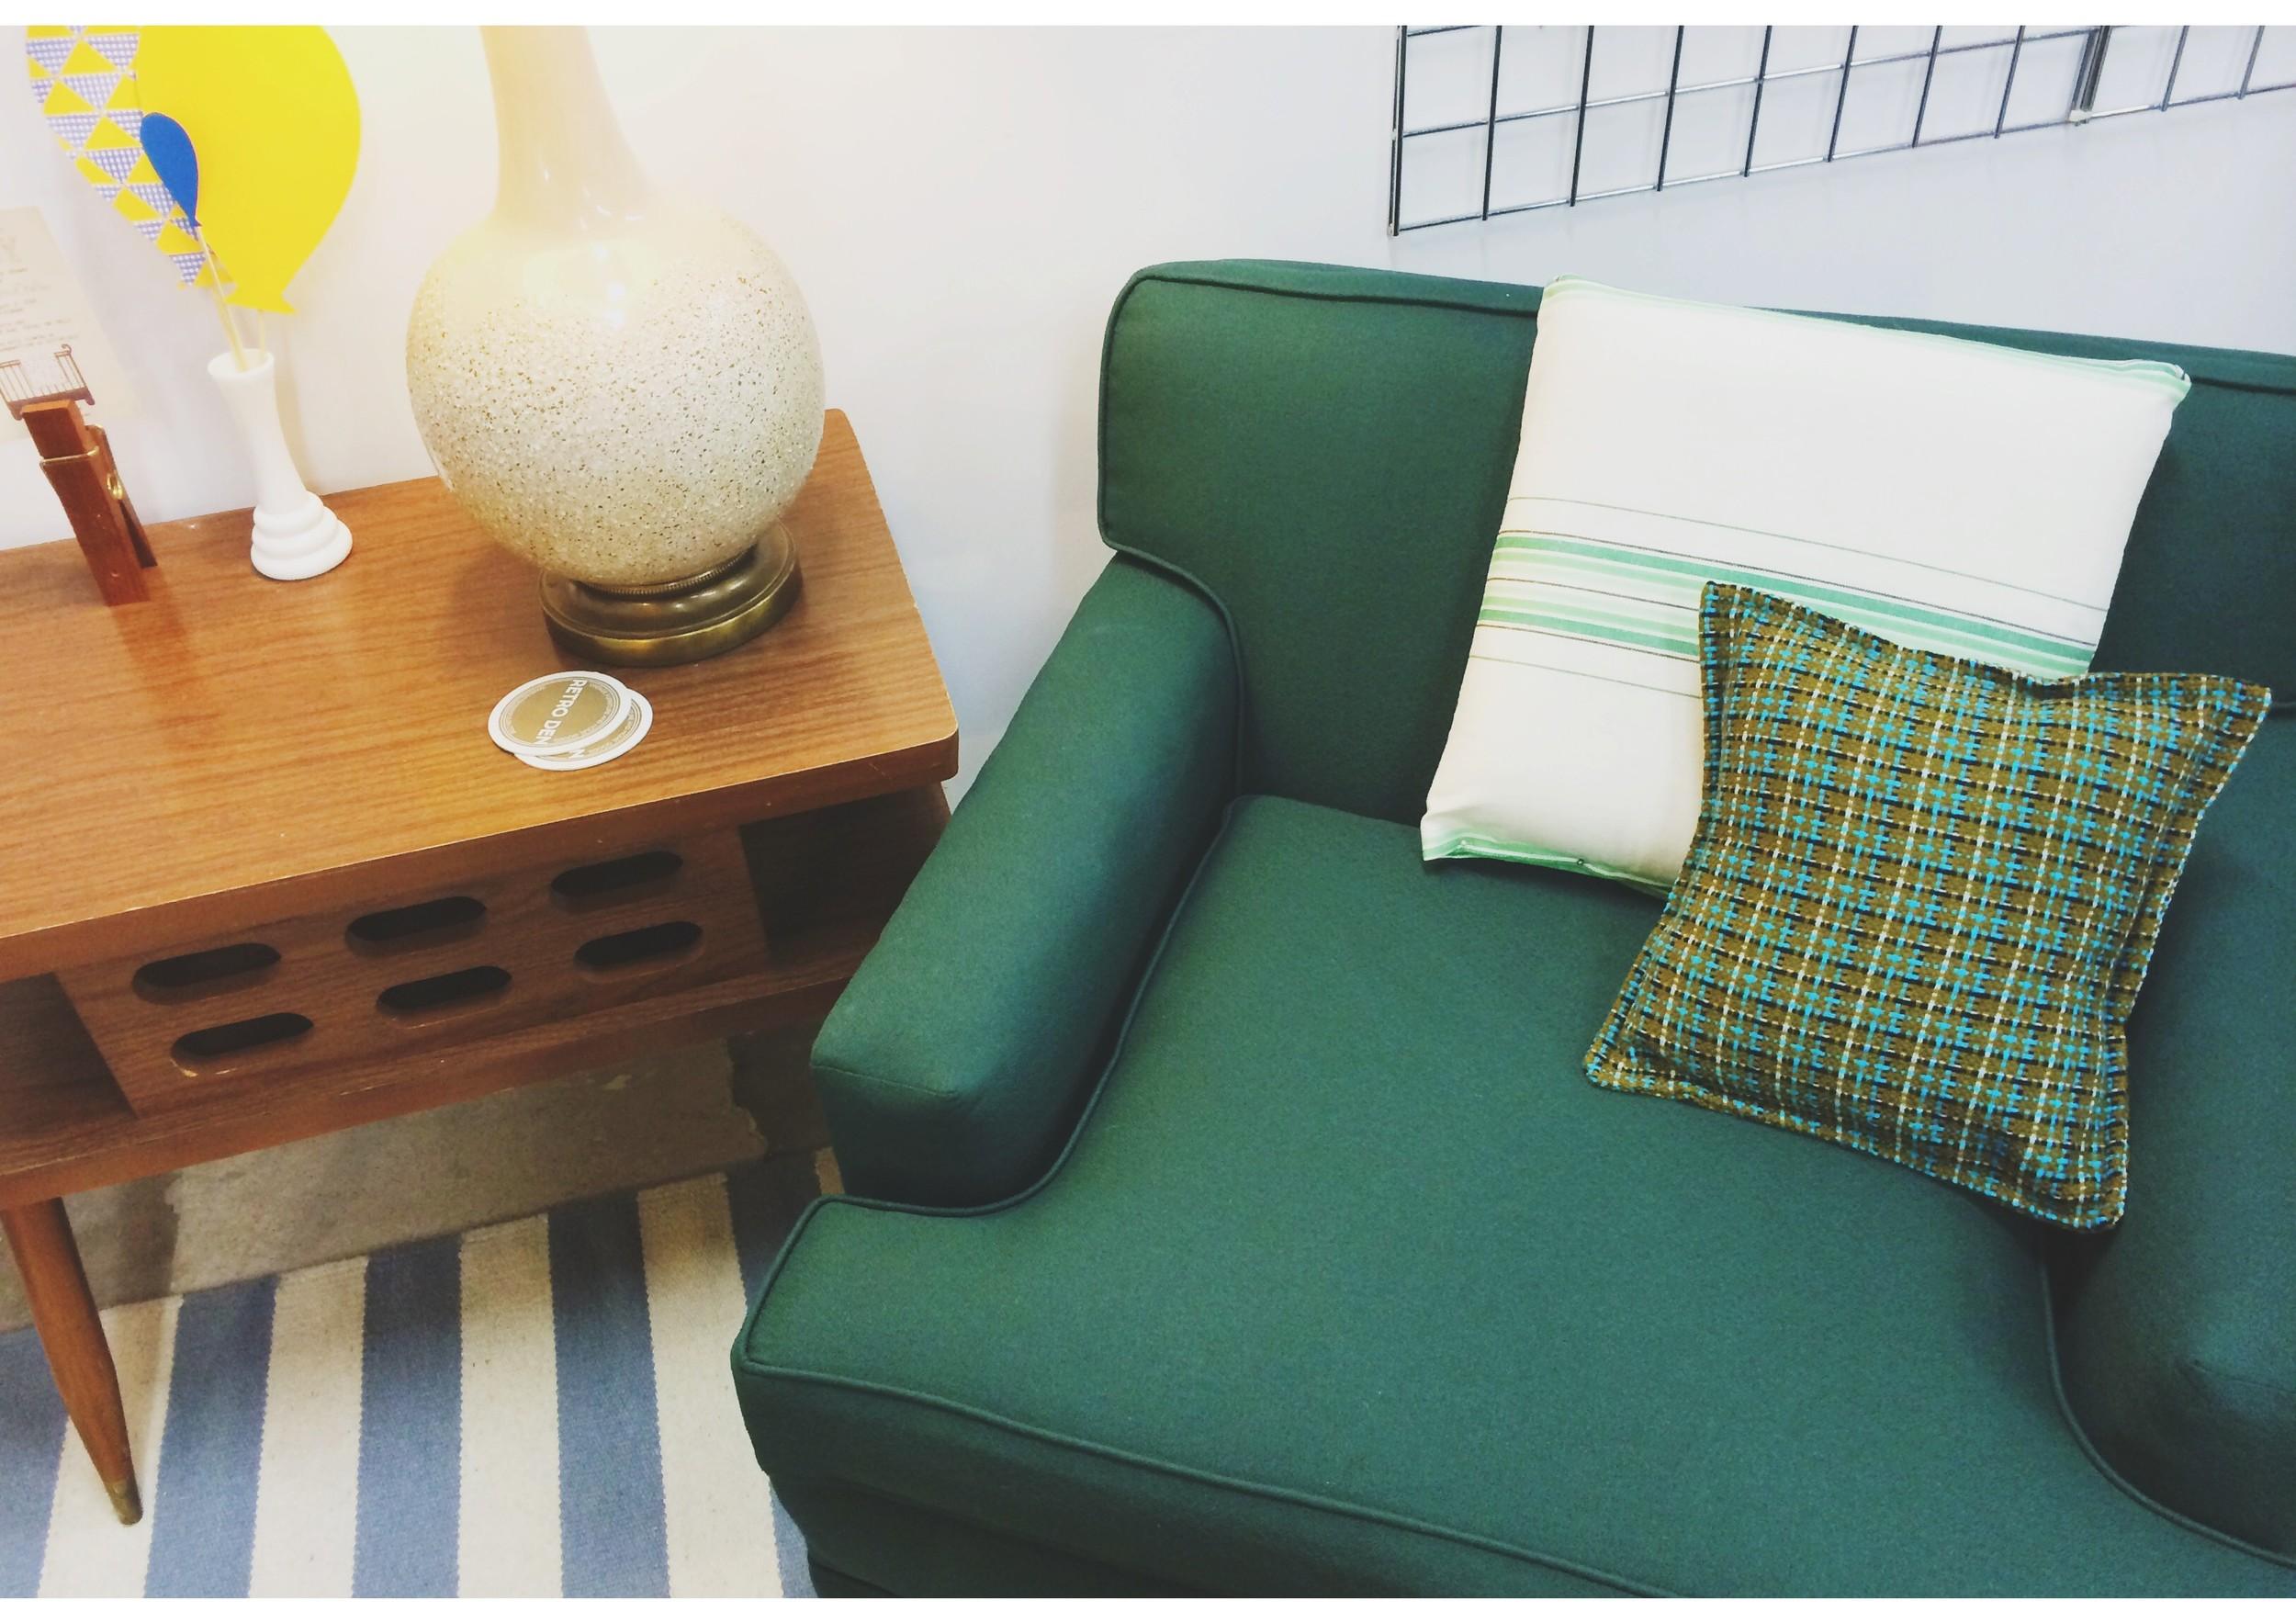 retro-chair-nursery-e1408414070201.jpg